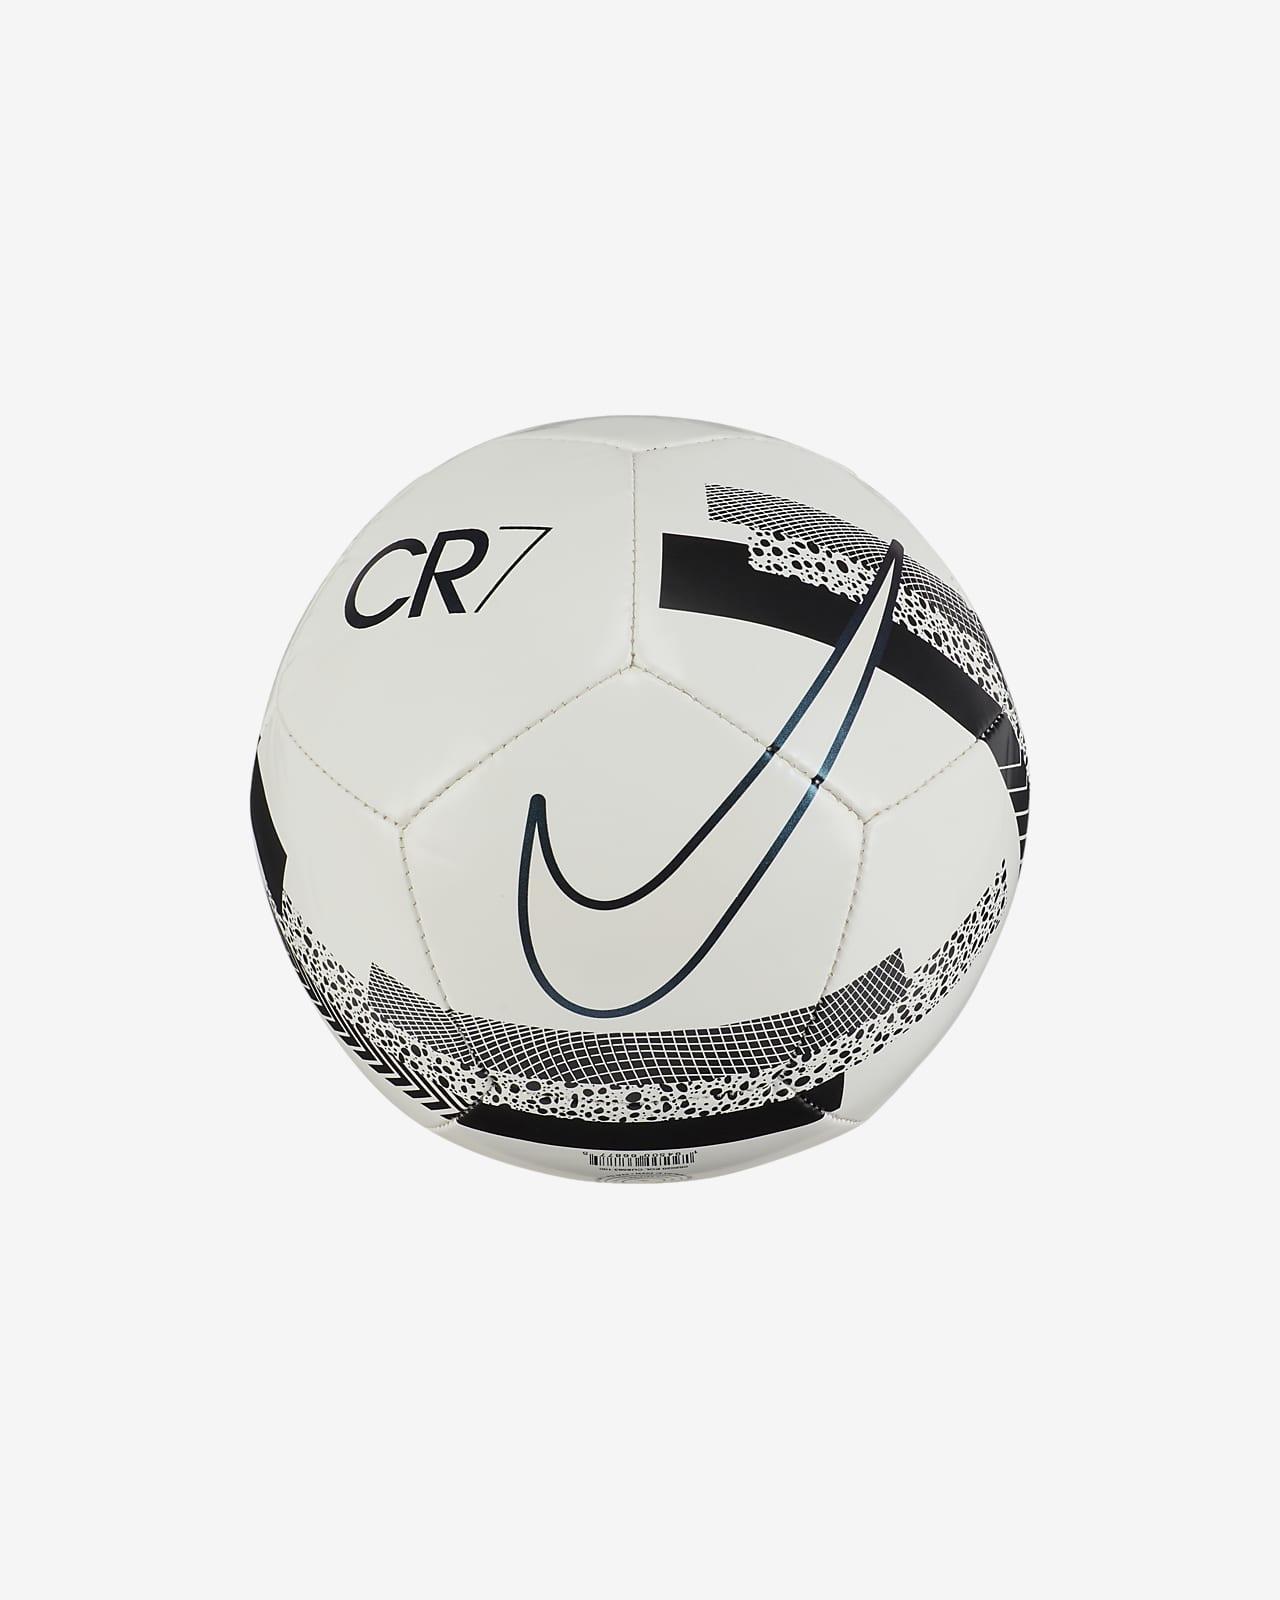 Autorizar licencia Turismo  Balón de fútbol Nike Skills CR7. Nike CL